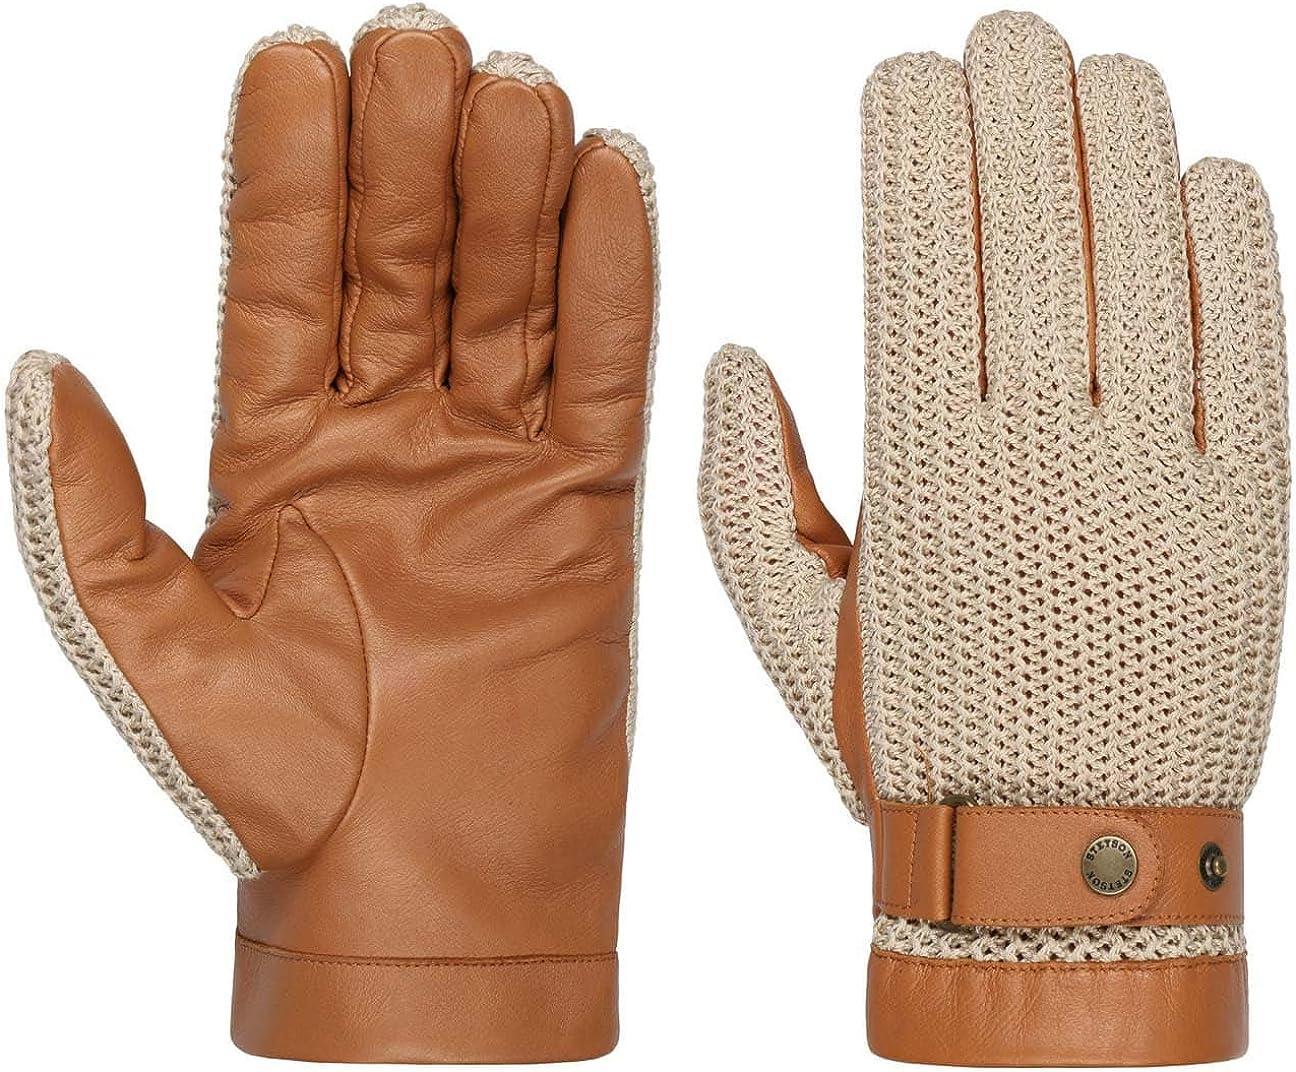 Stetson Sheep Nappa Leather & Knit Gloves Women/Men -